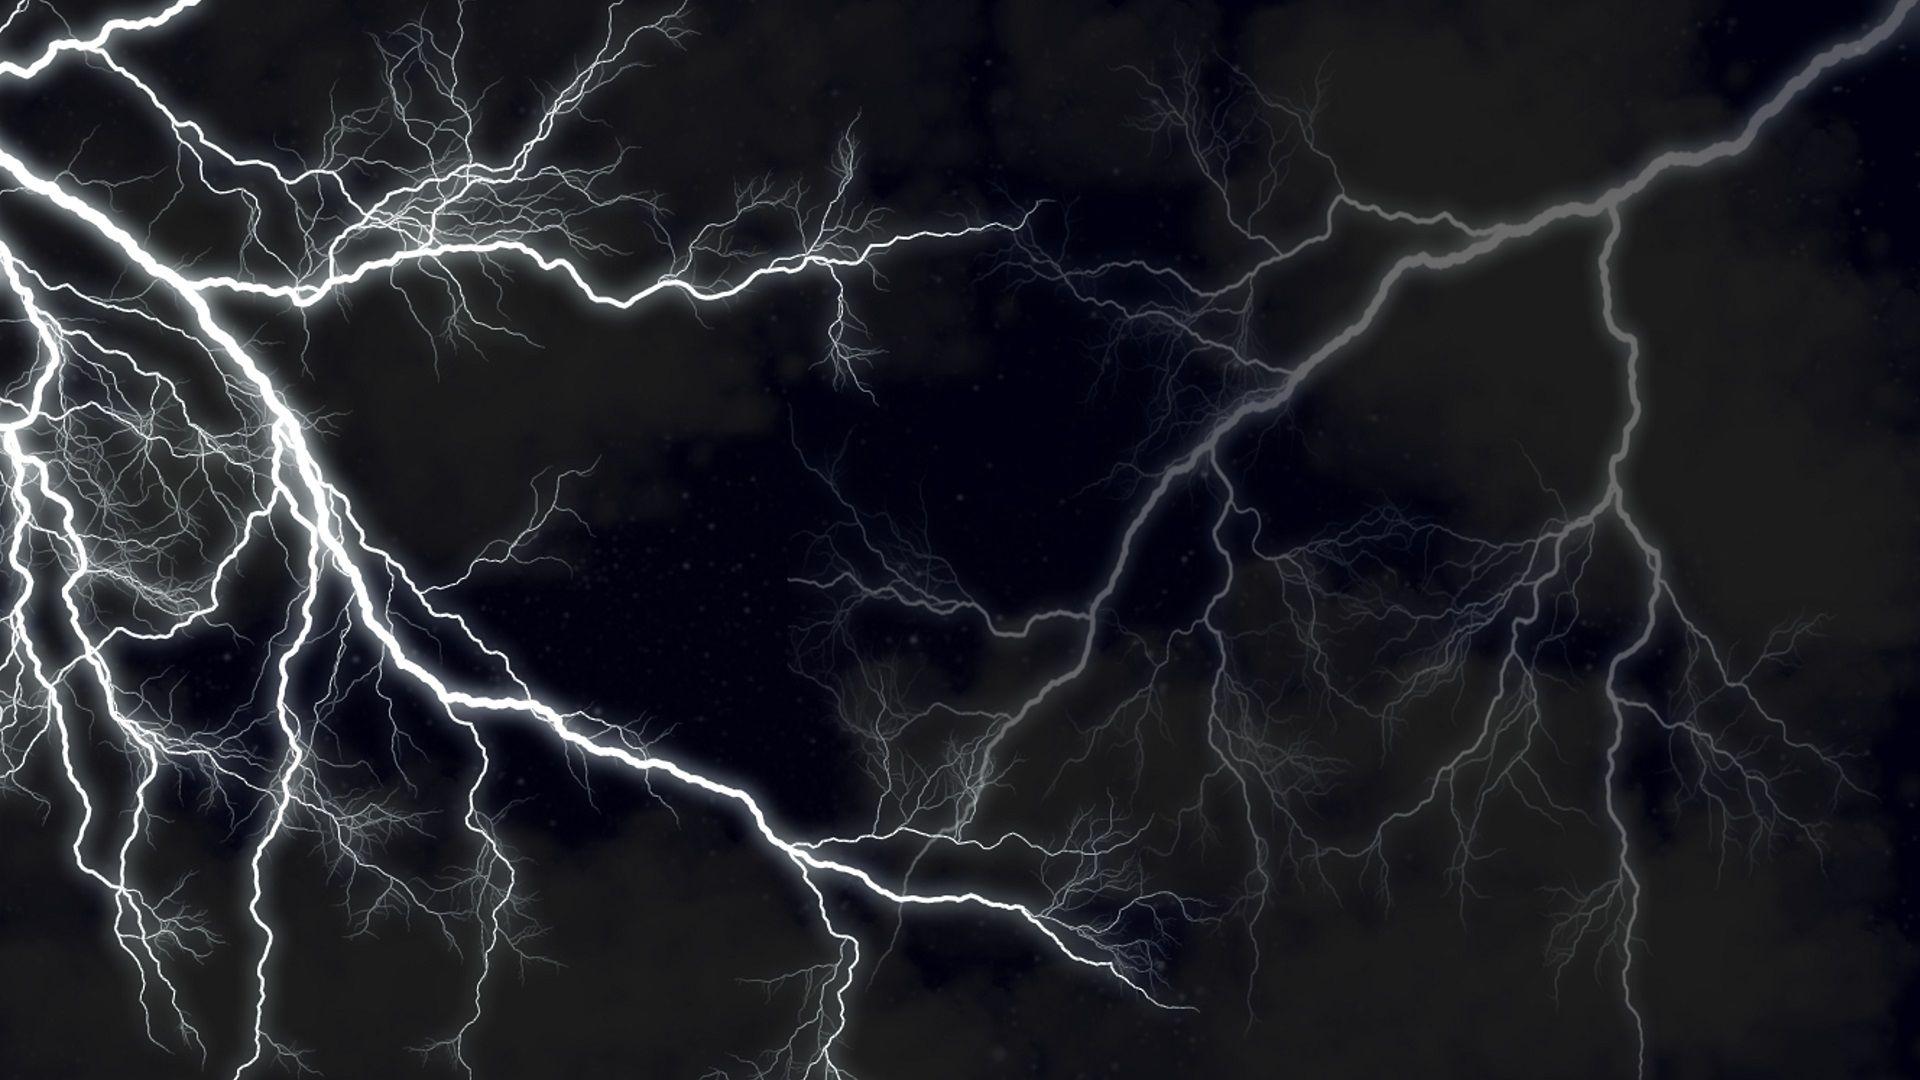 Lightning strikes again bolt kills three in india - Lighting strike wallpaper ...